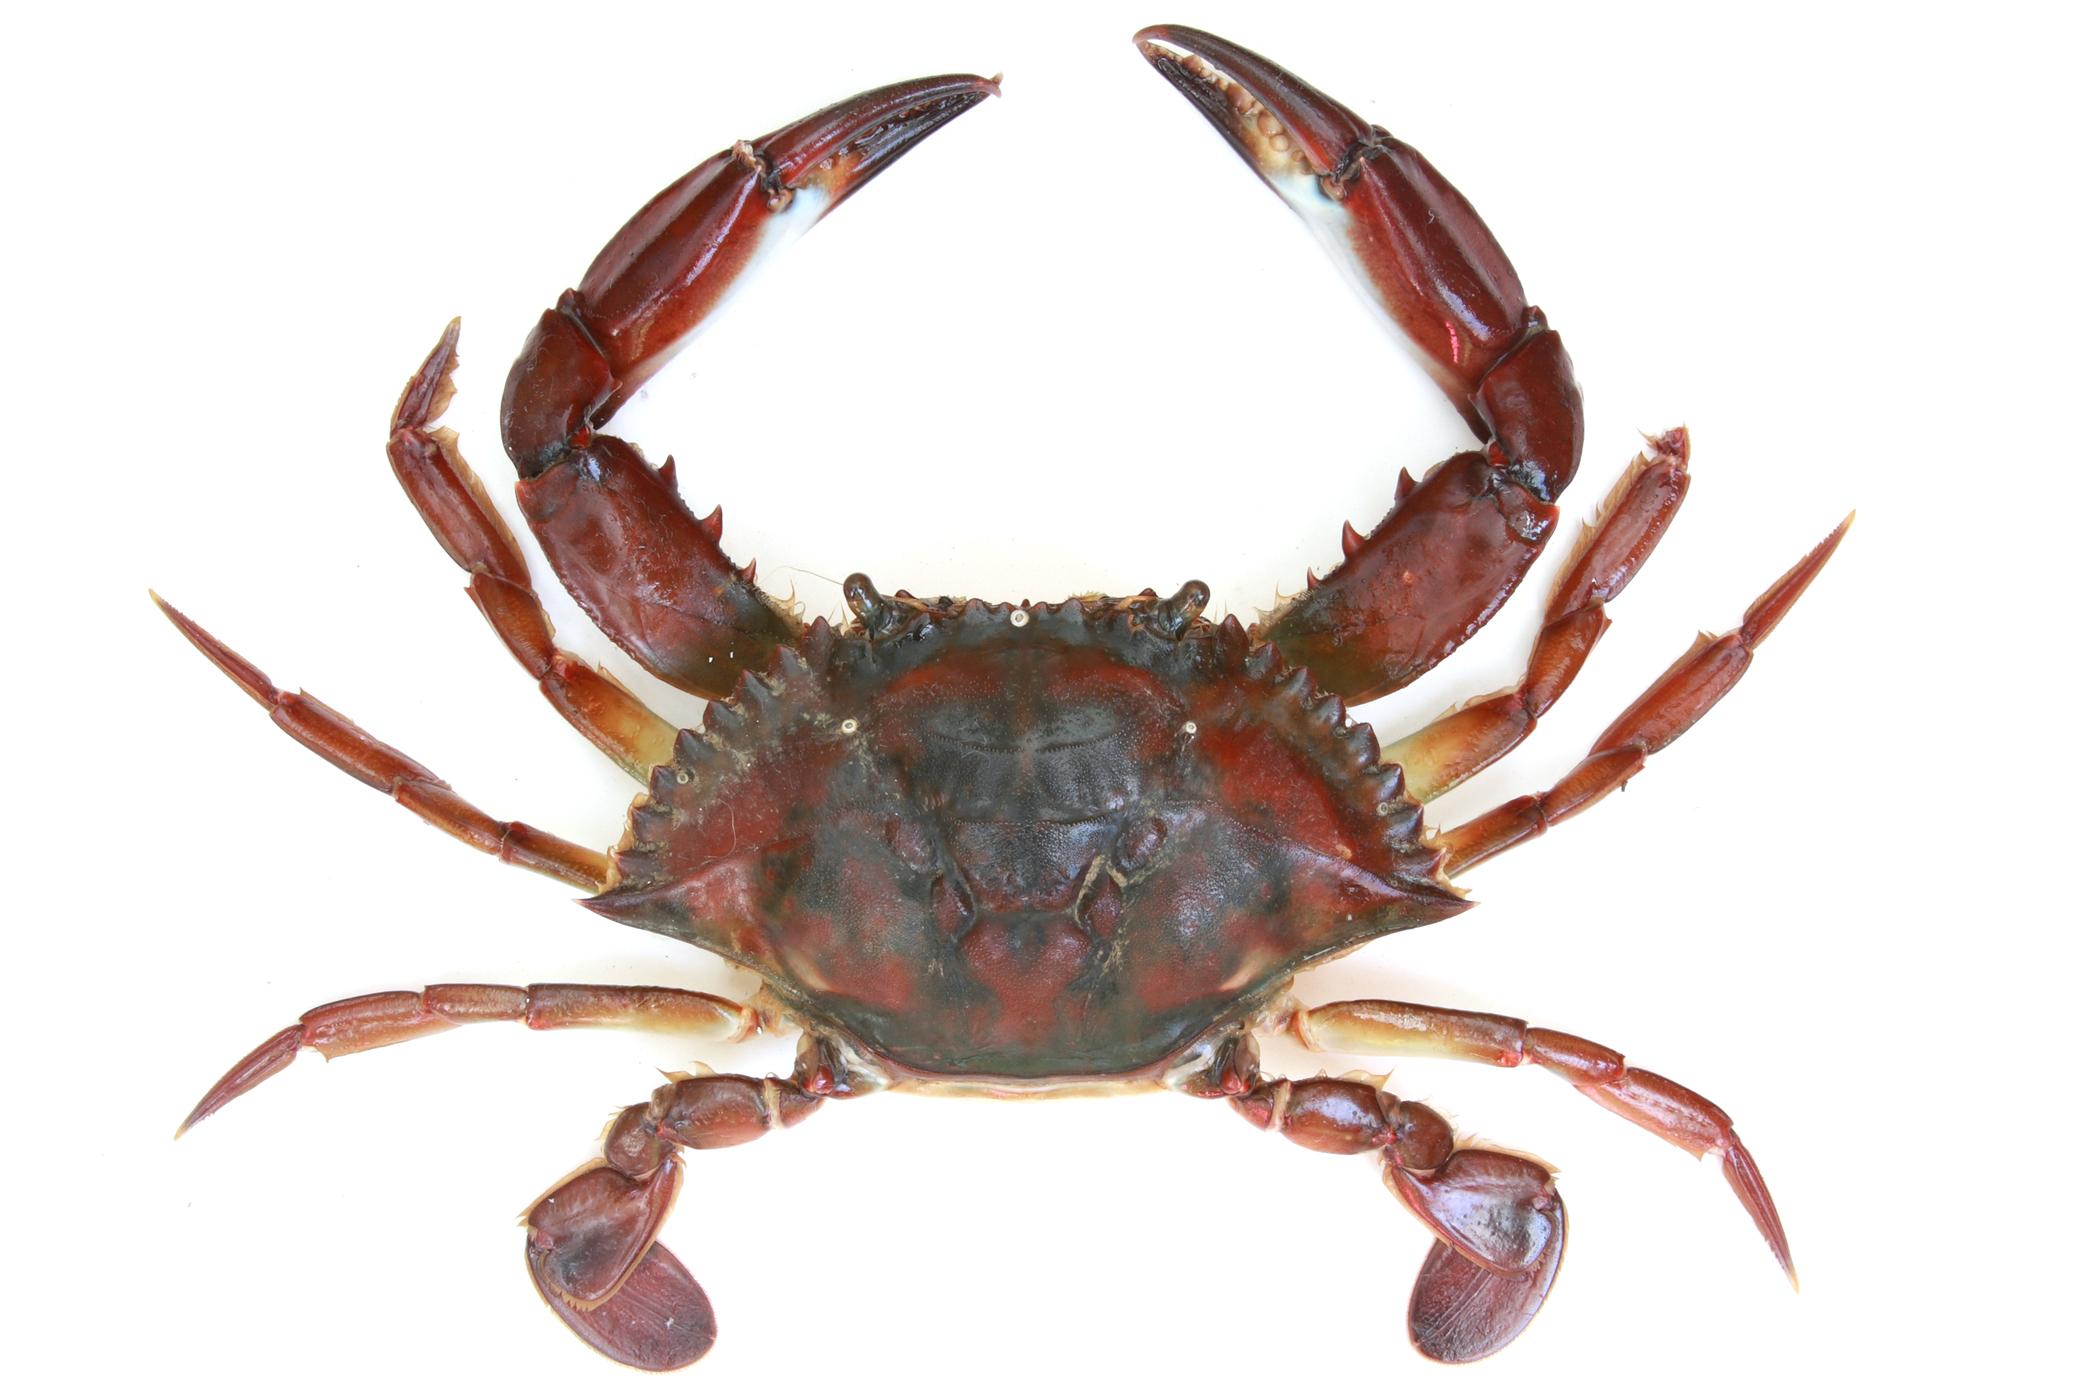 Image of Bocourt swimming crab